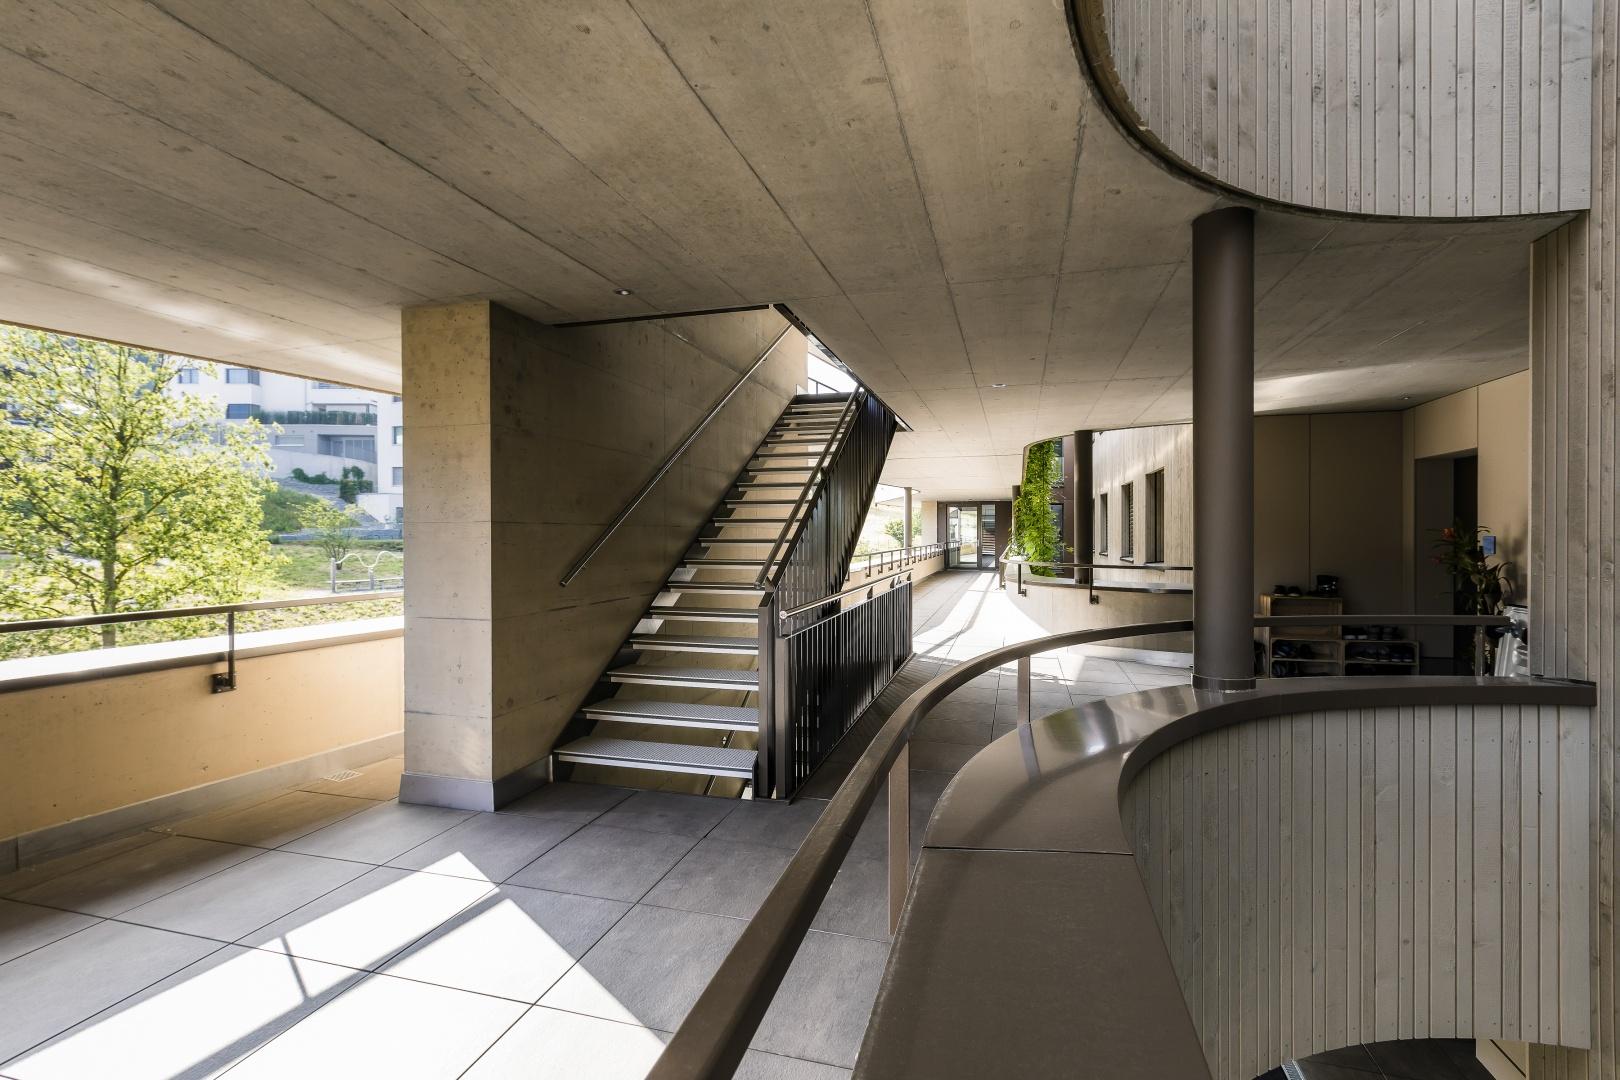 Laubengänge mit Treppe © IMAGESTUDIO | philipp koch photography